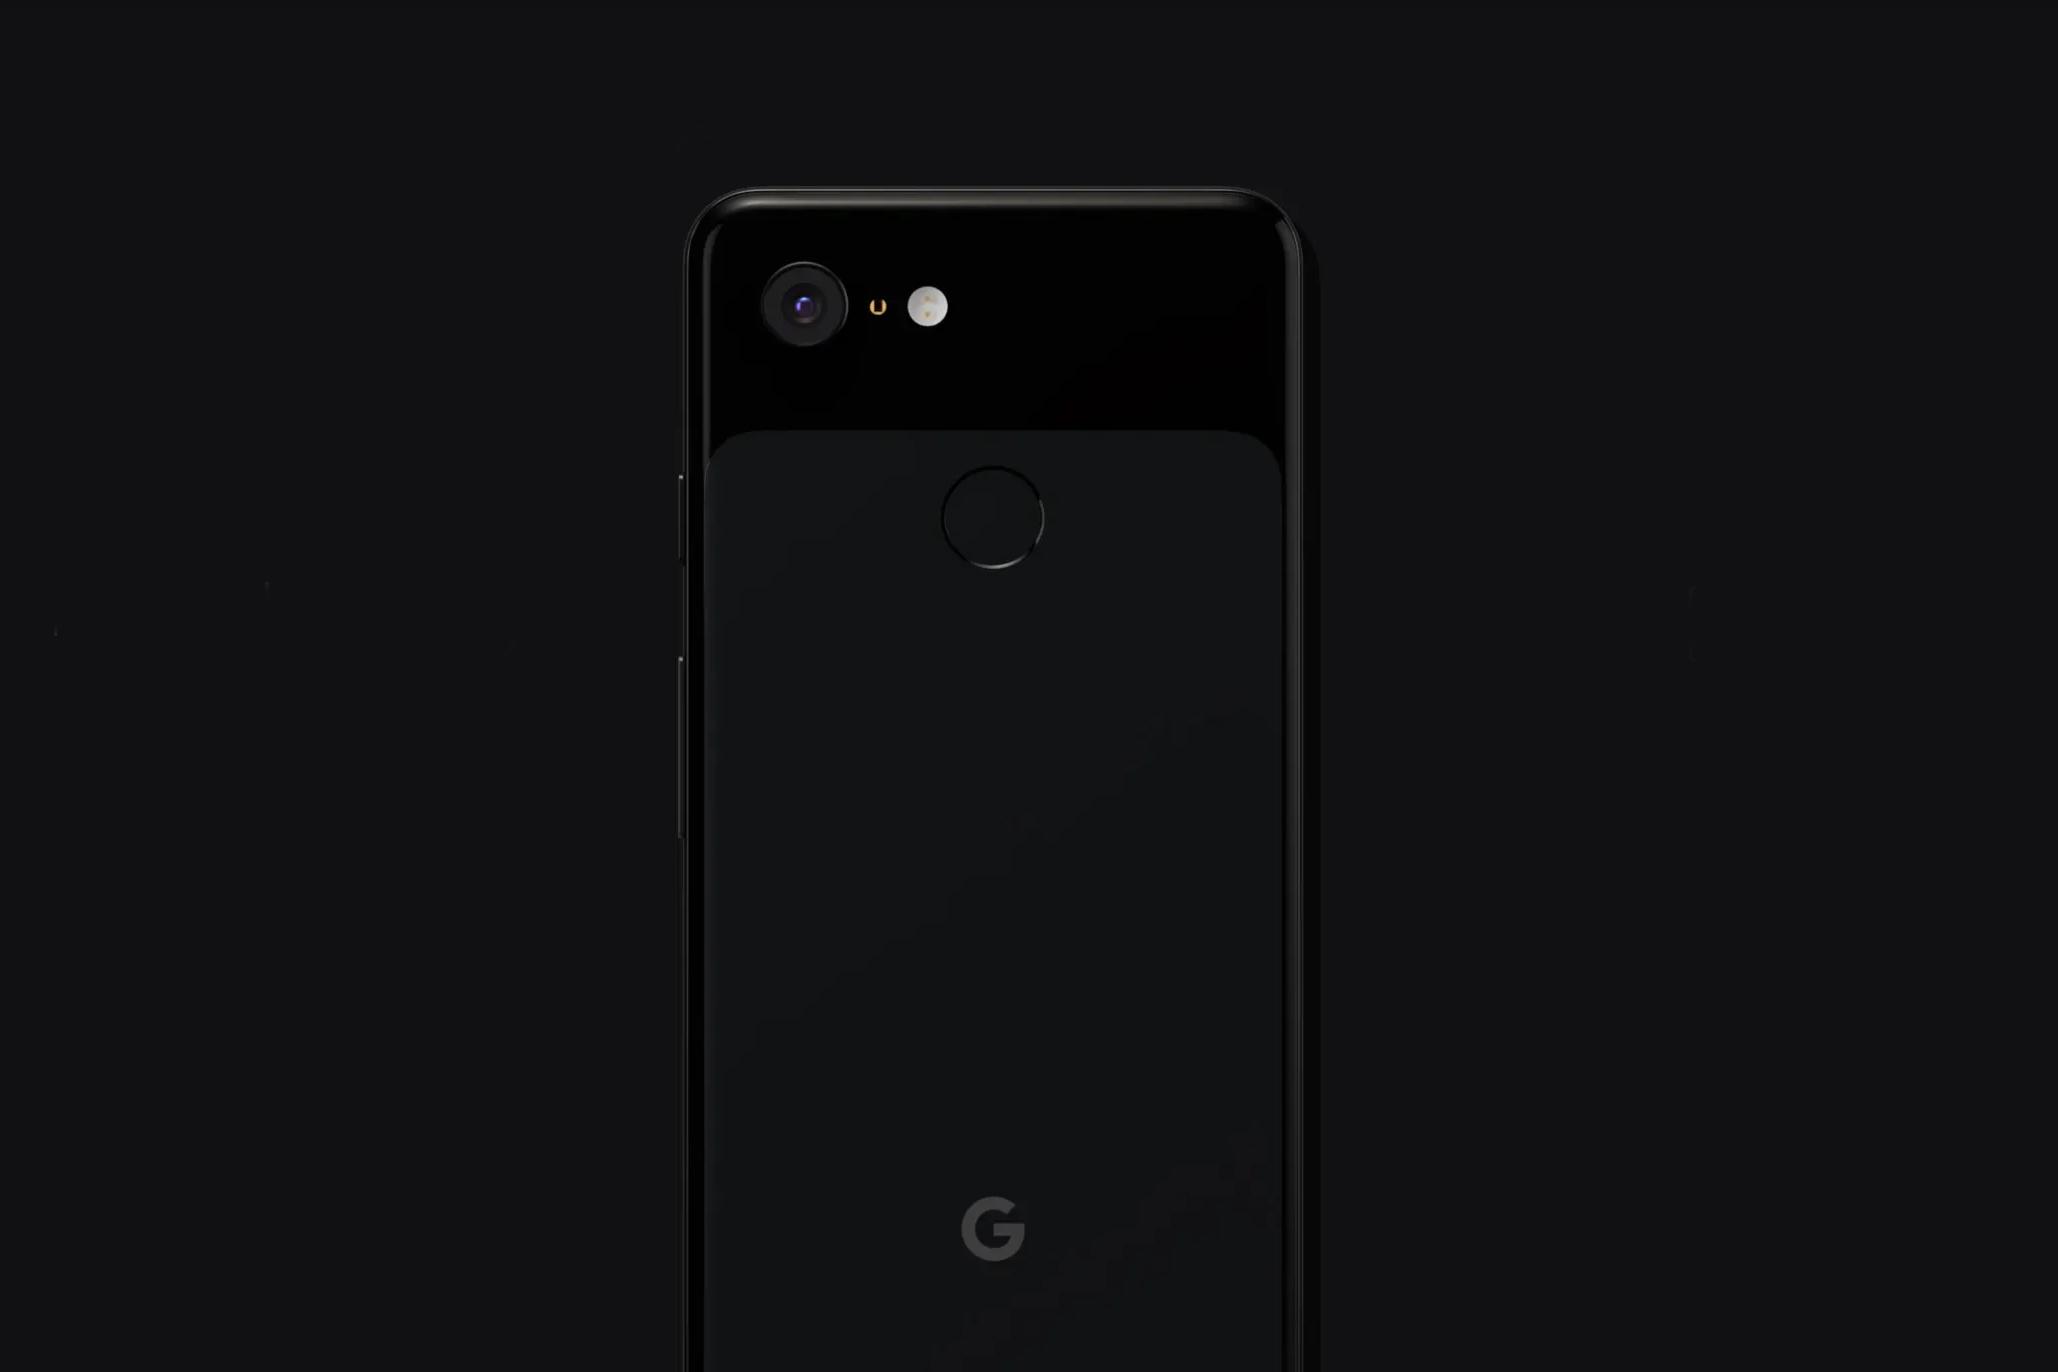 Google Pixel 3 和 Pixel 3 XL - 有什么区别?